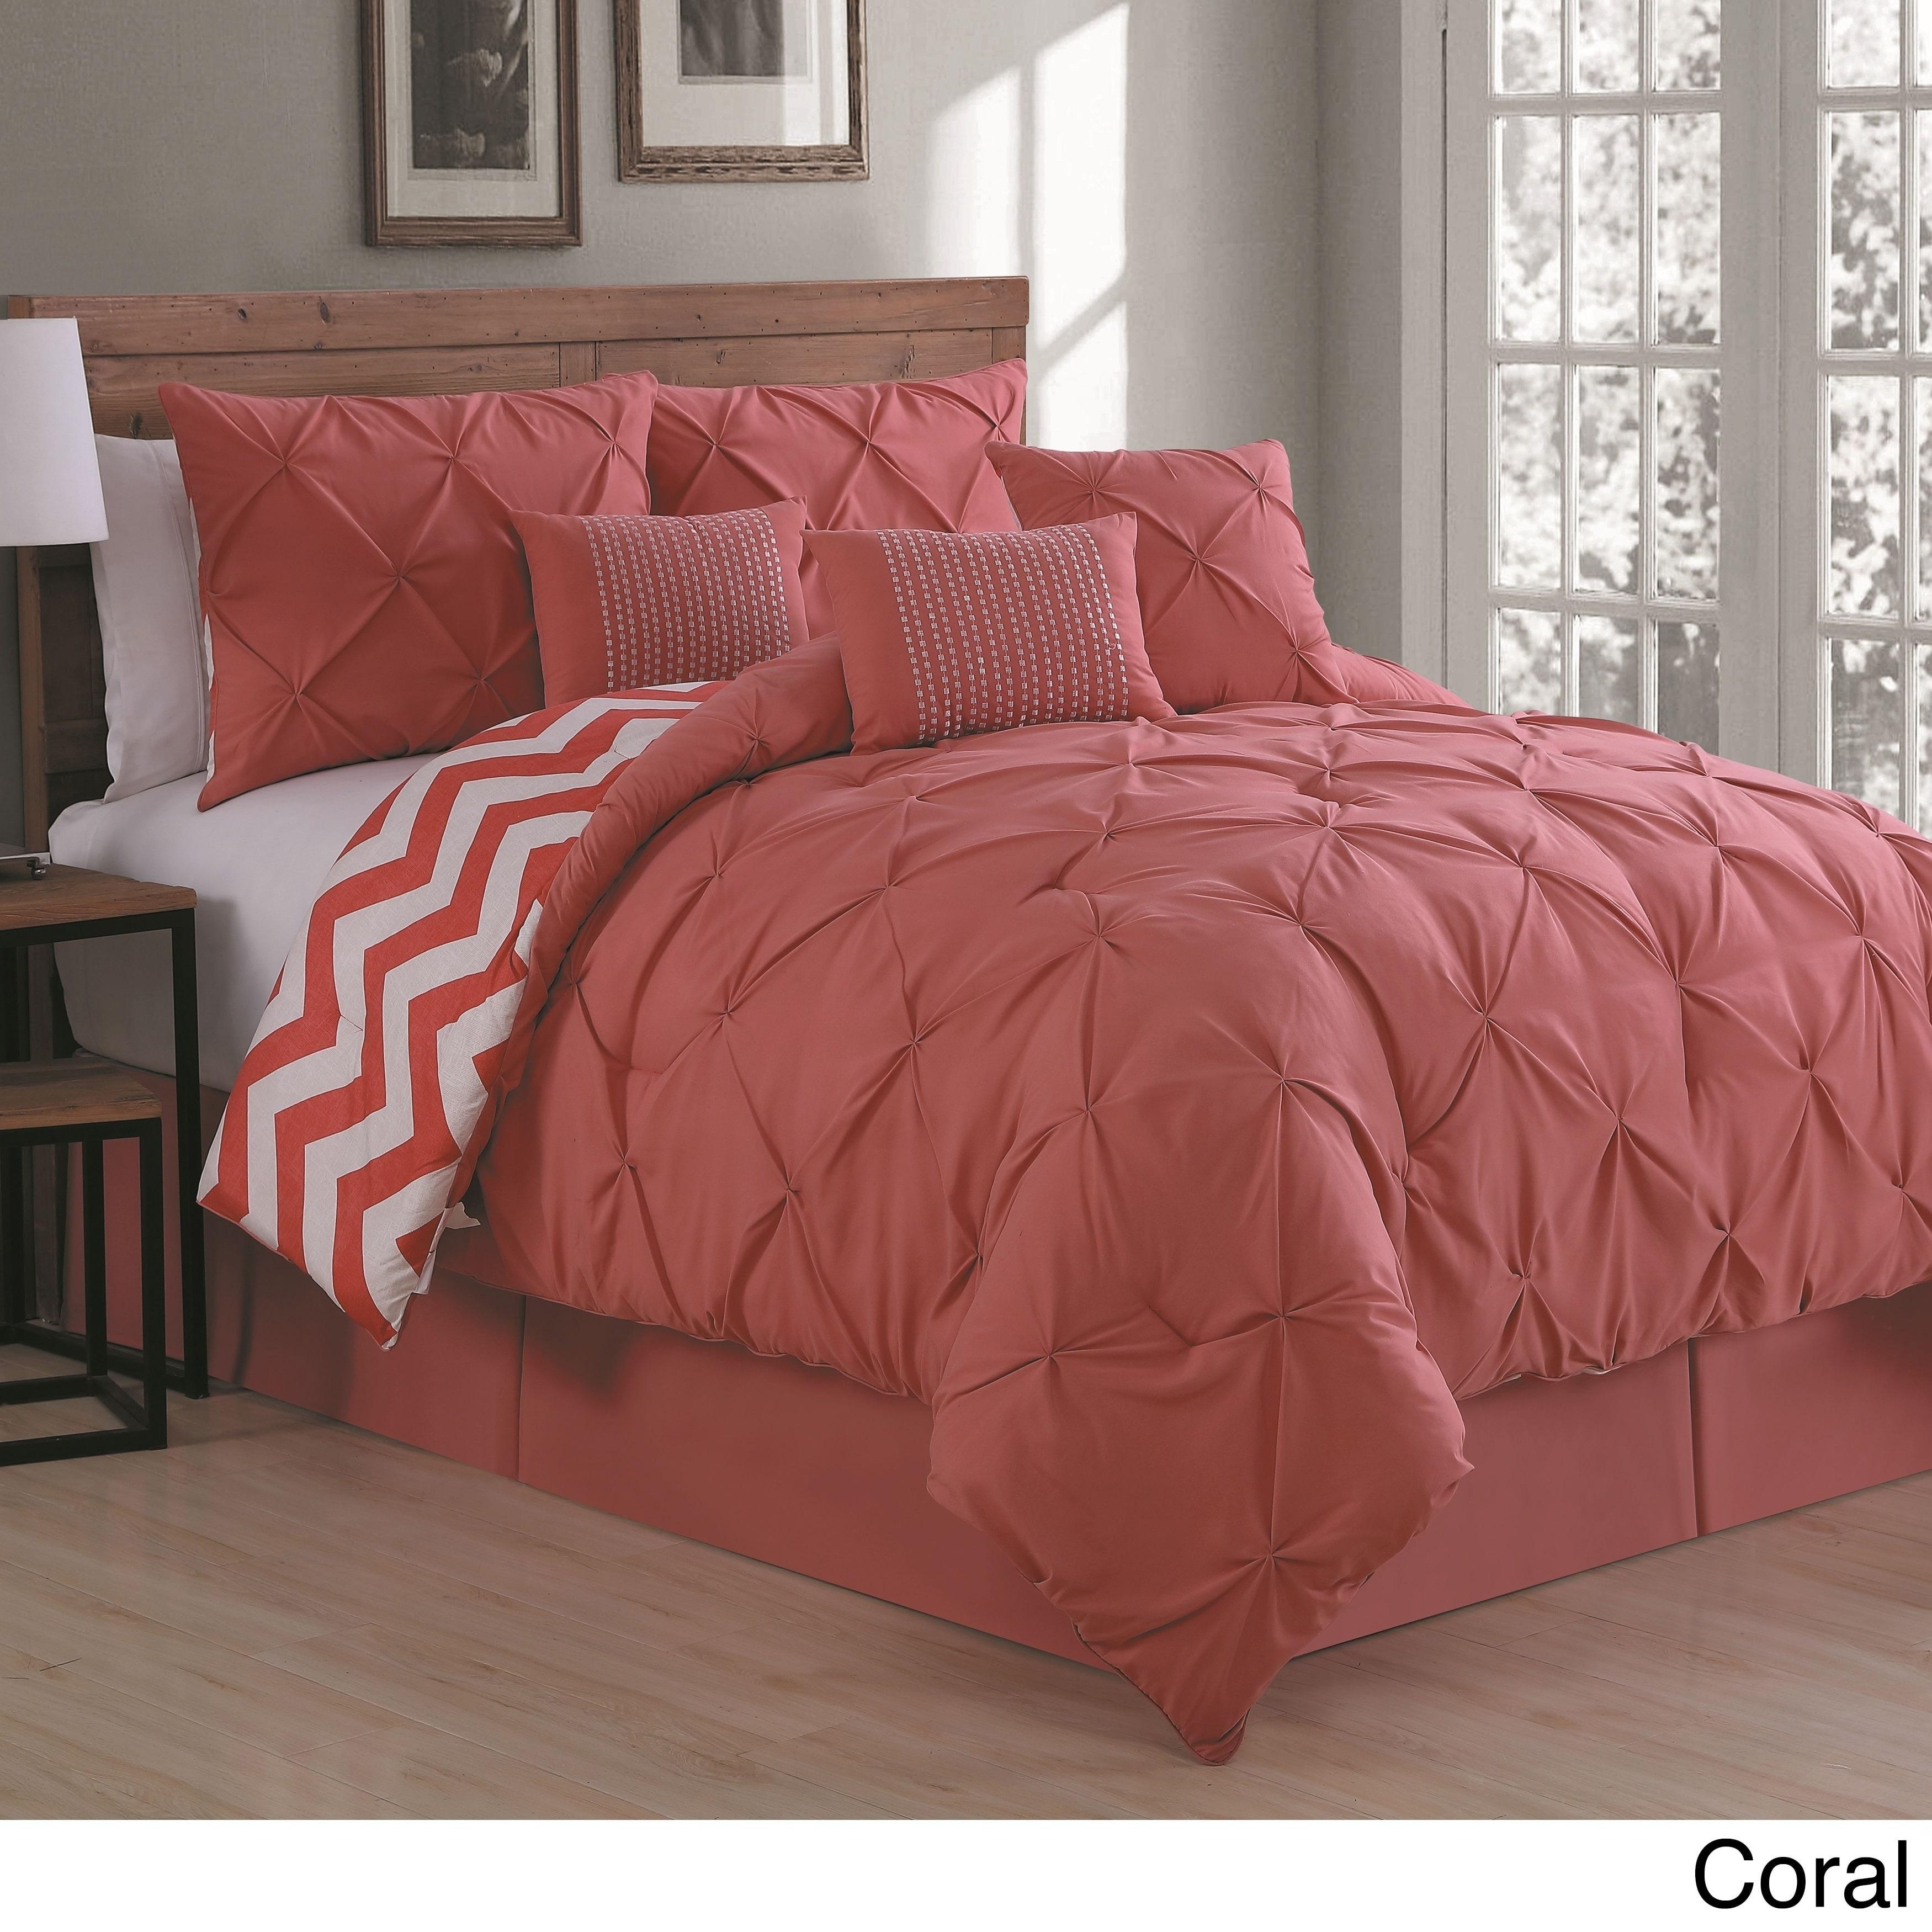 Avondale Manor Ella Pinch Pleat Reversible 7 Piece Comforter Set On Free Shipping Today 20559032